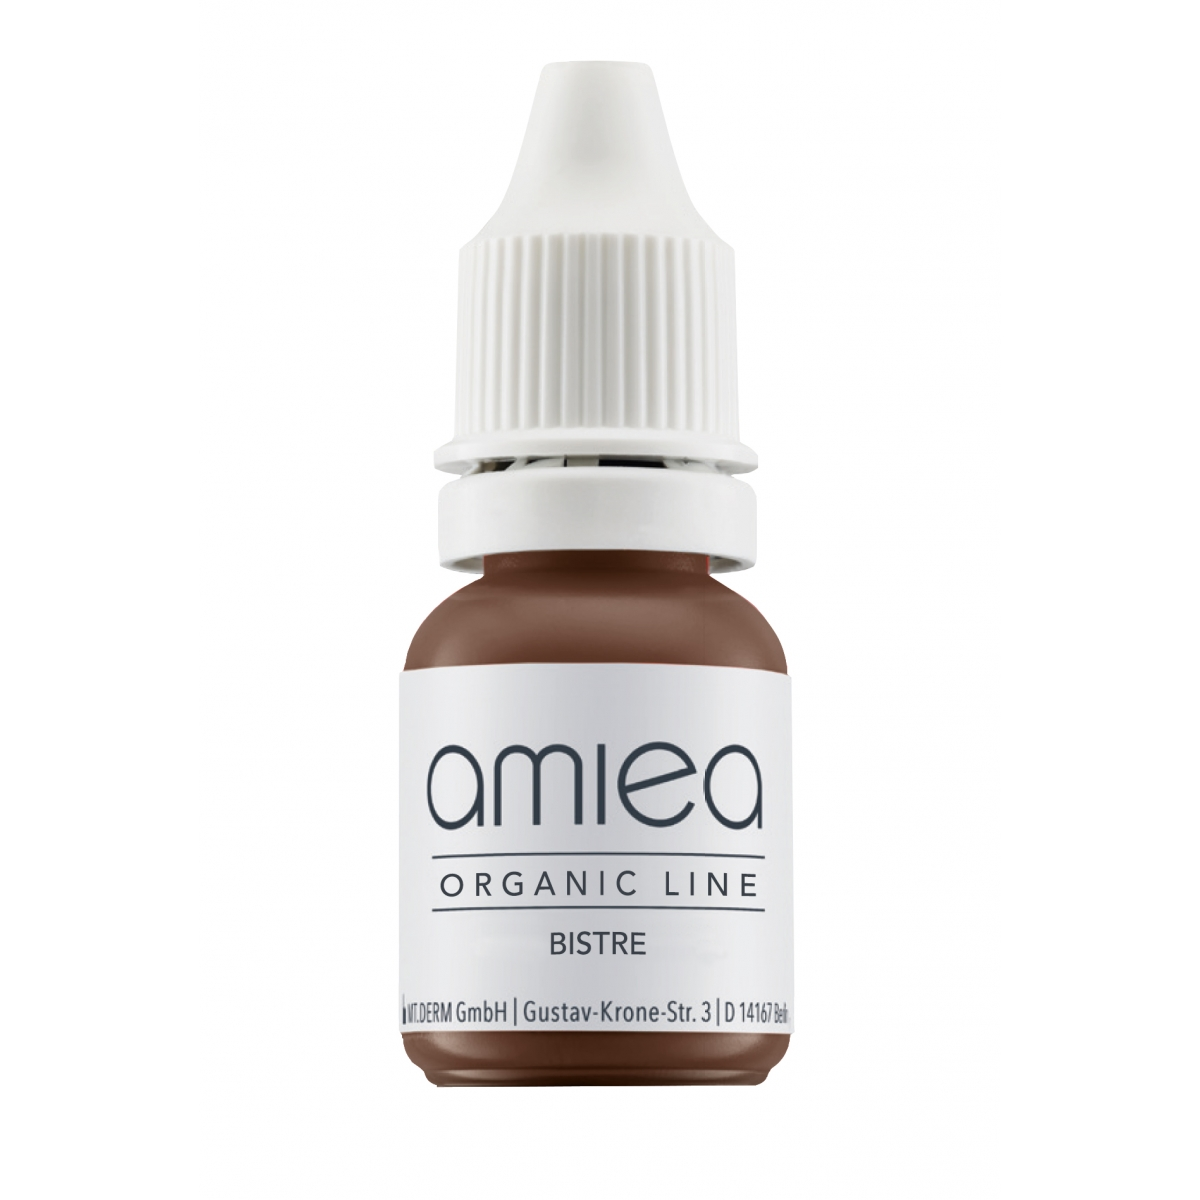 ORGANIC LINE (10ml) - PIGMENT BISTRE ORGANICLINE AMIEA (10 ml)